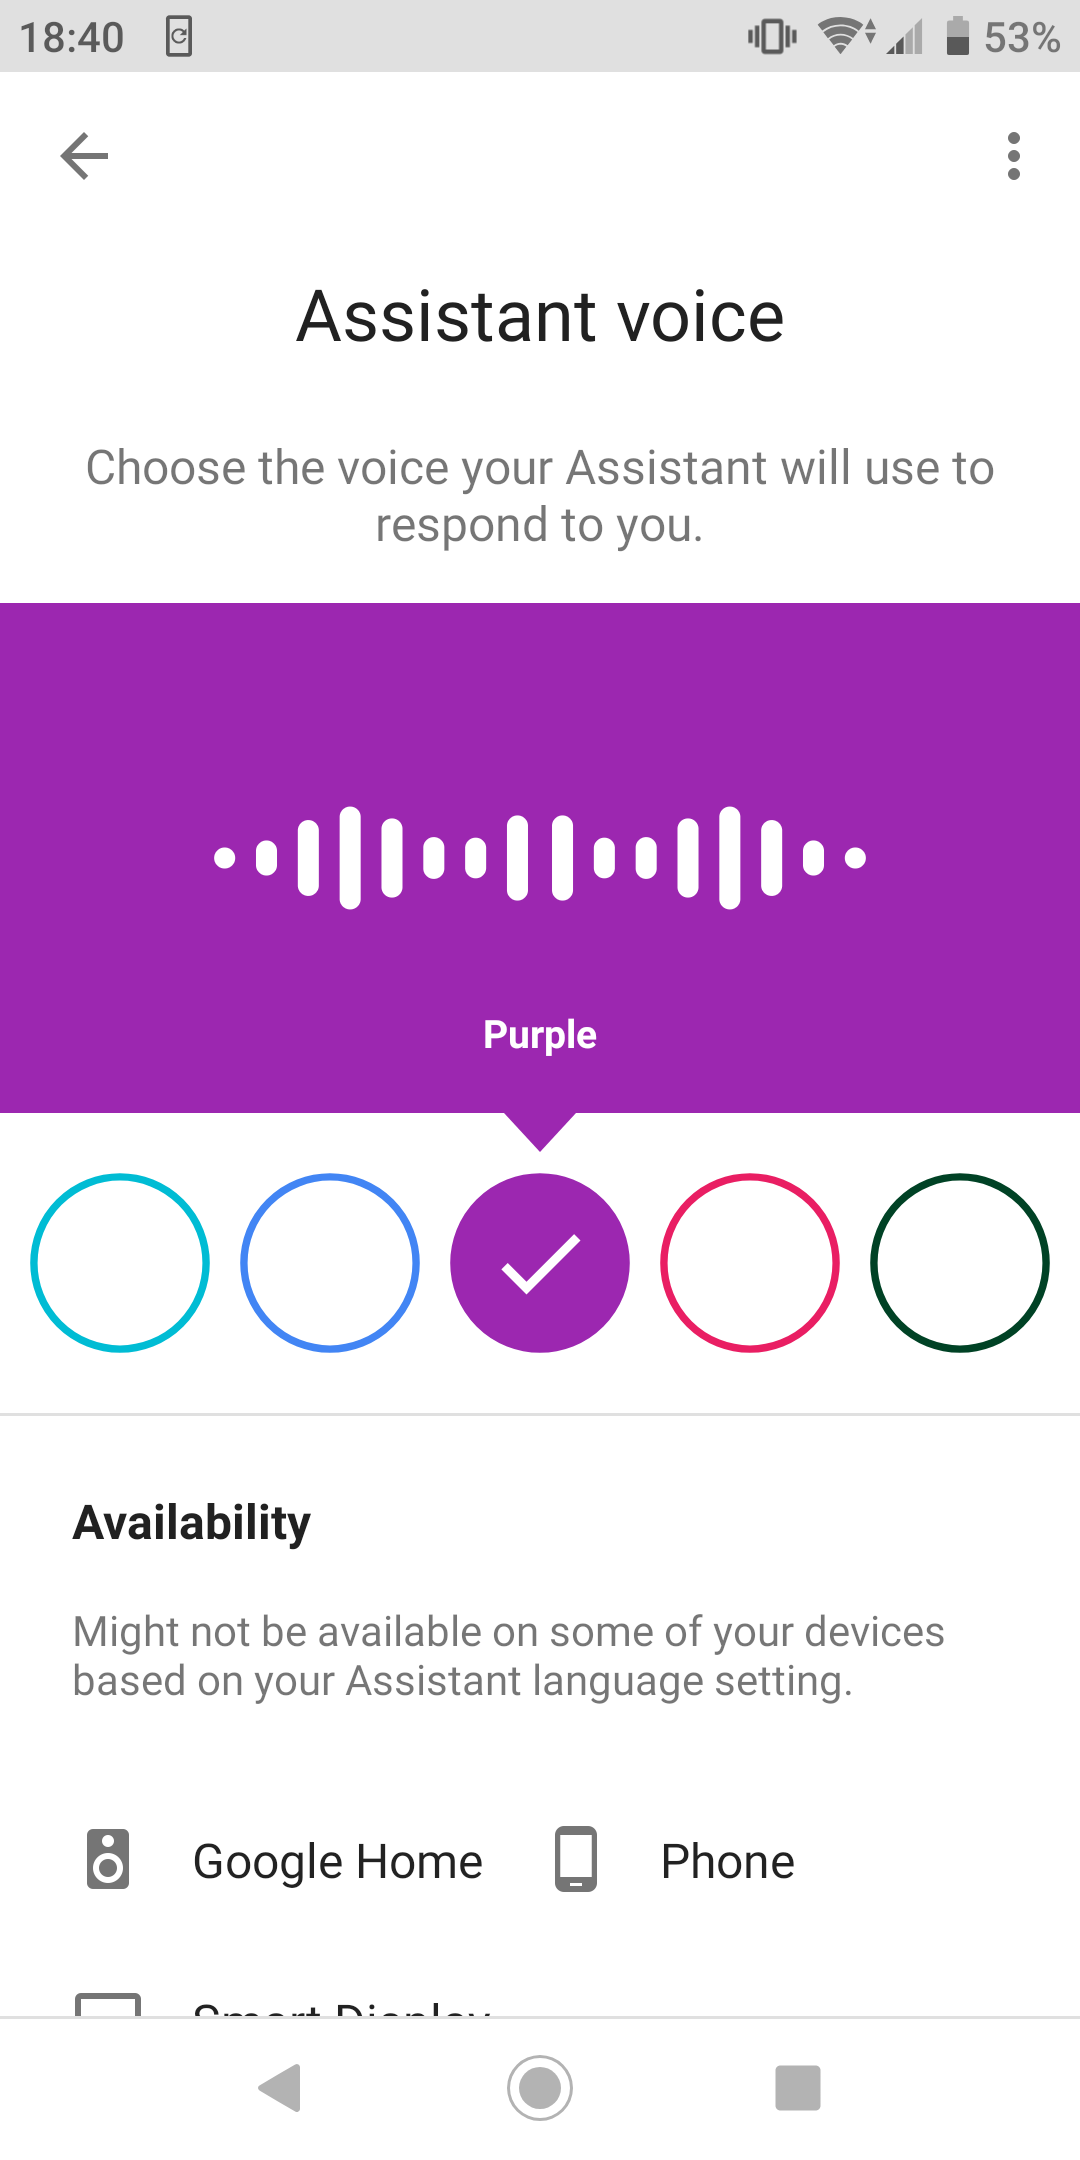 Opsi suara yang berbeda untuk Google Assistant dinamai berdasarkan warna alih-alih menggunakan rumus [kebangsaan] + jenis kelamin yang digunakan untuk penamaan suara Siri.